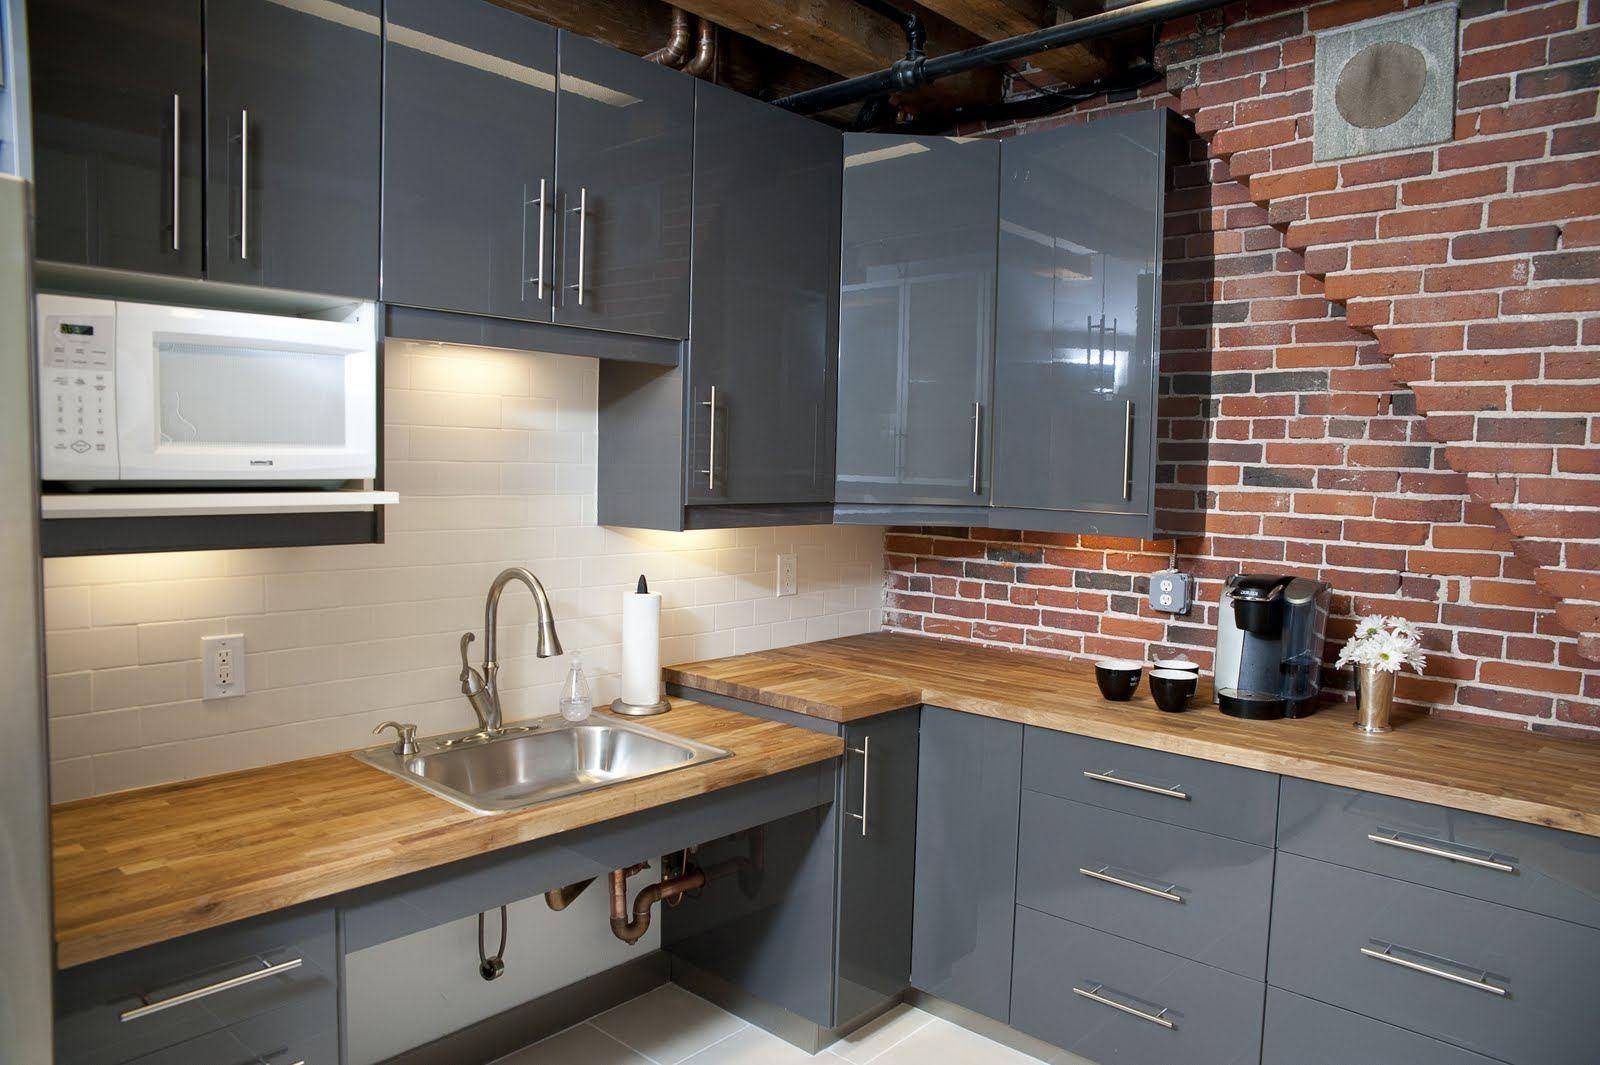 Cool backsplash from brick kitchens